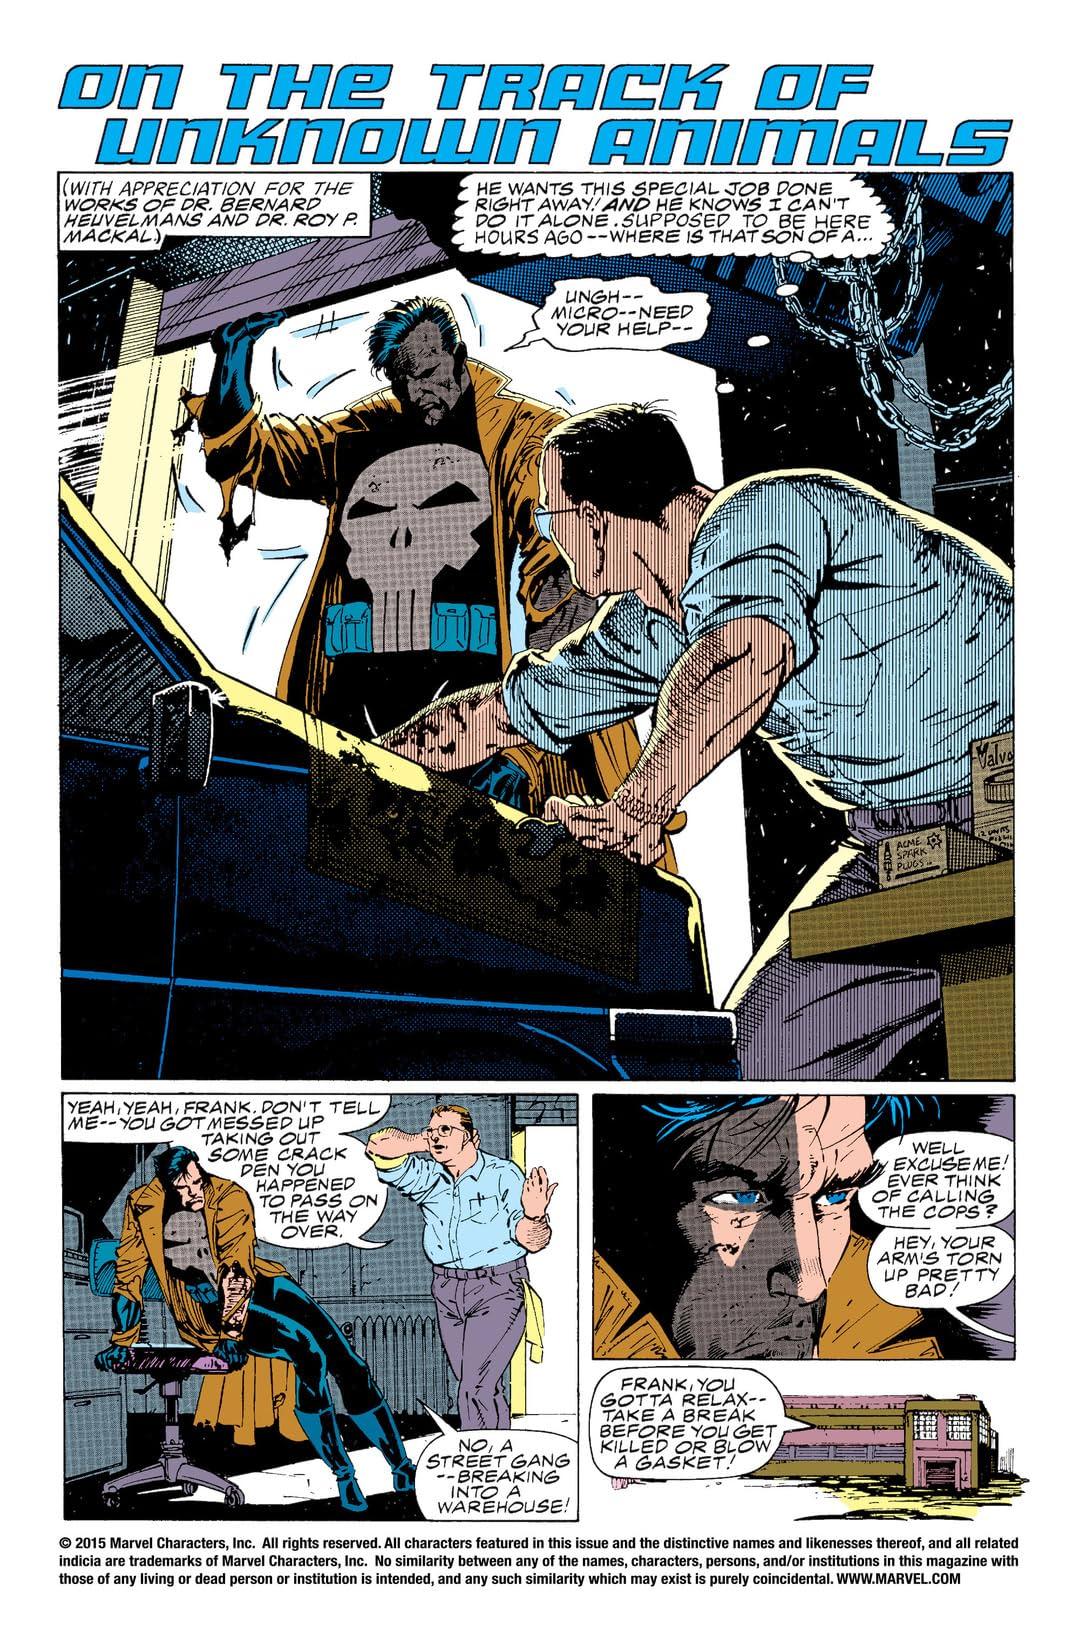 Wolverine vs. The Punisher